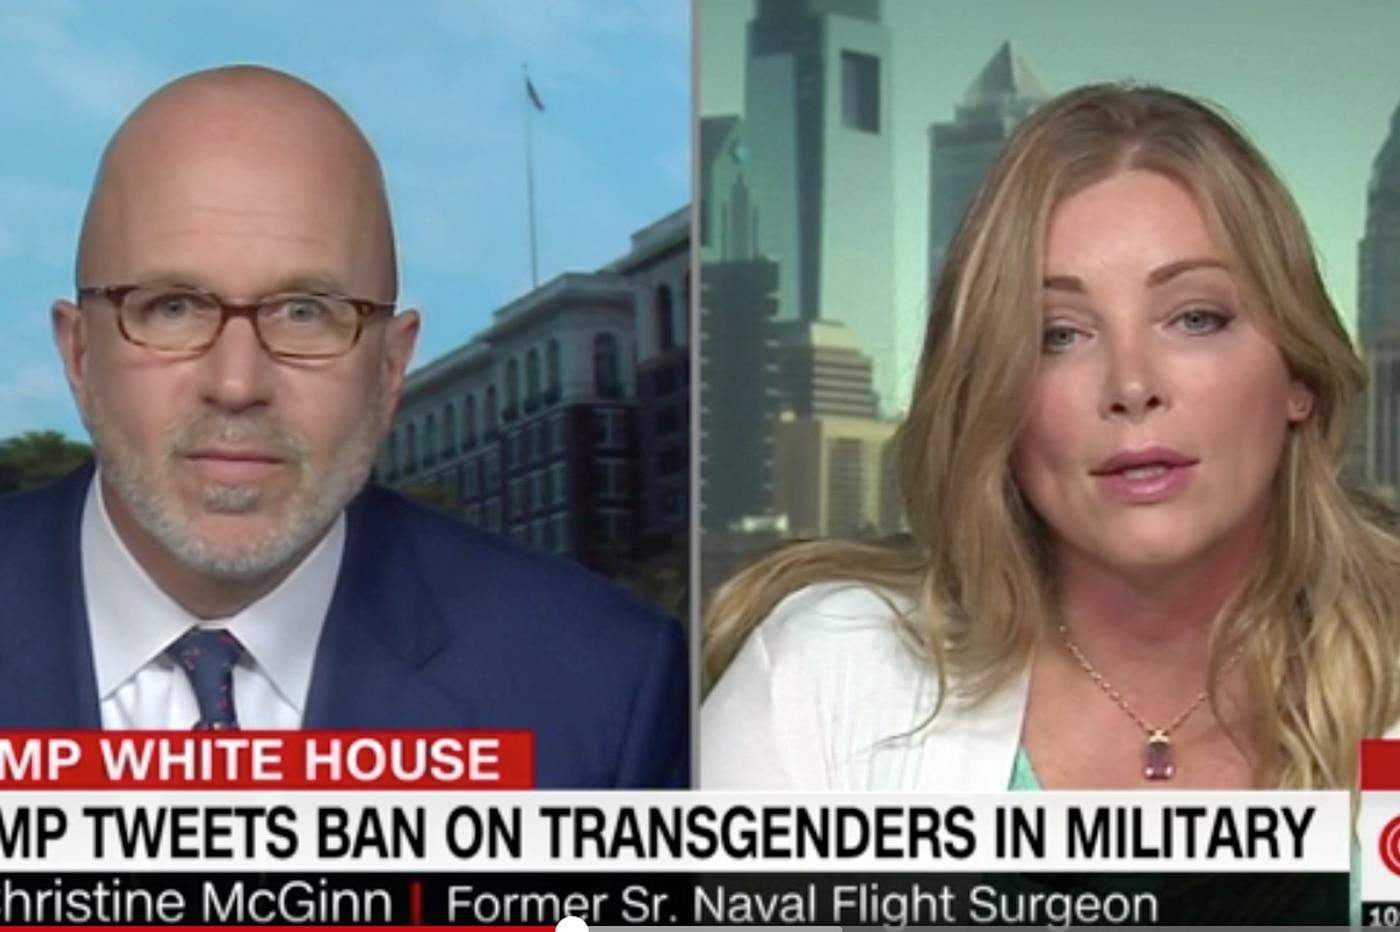 Despite Trump tweets, Pa. surgeon treats transgender people in the military | Michael Smerconish